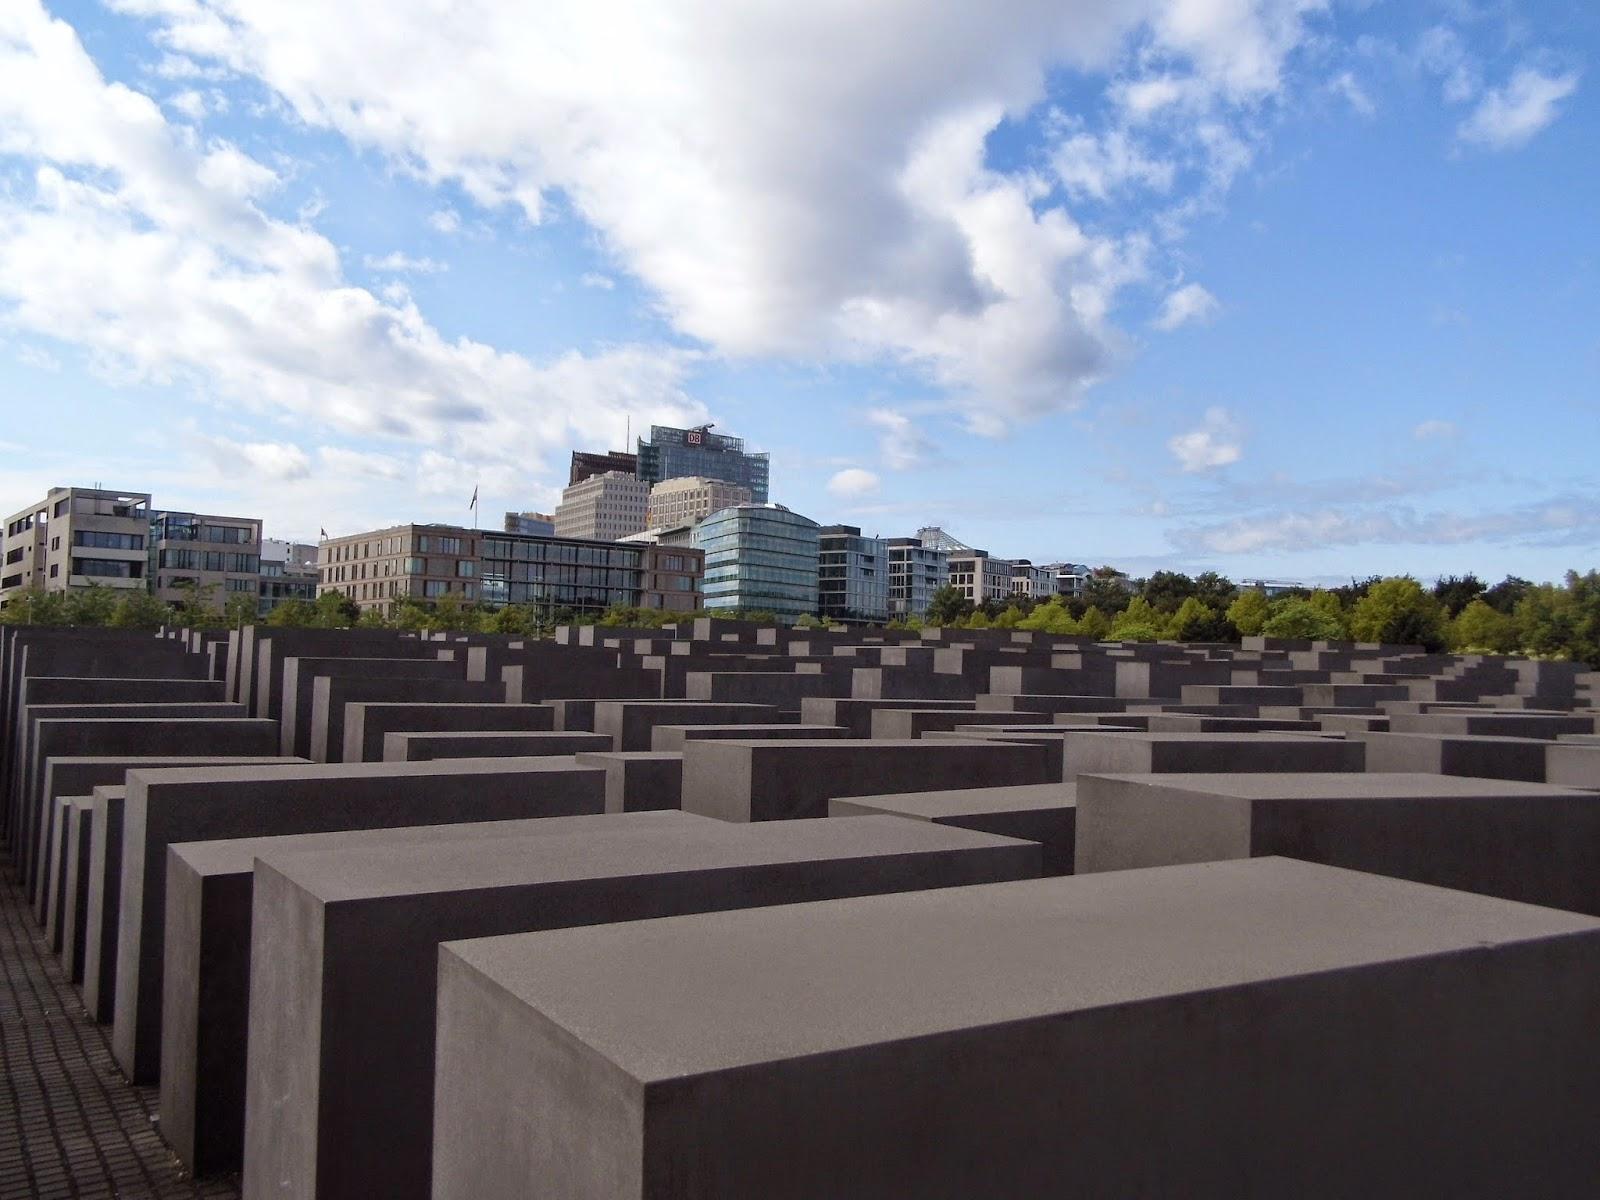 Memorial to the Murdered Jews of Europe, Pomnik Pomordowanych Żydów Europy, Denkmal für die ermordeten Juden Europas lub Holocaust-Mahnmal  Berlin Marta Deląg photography